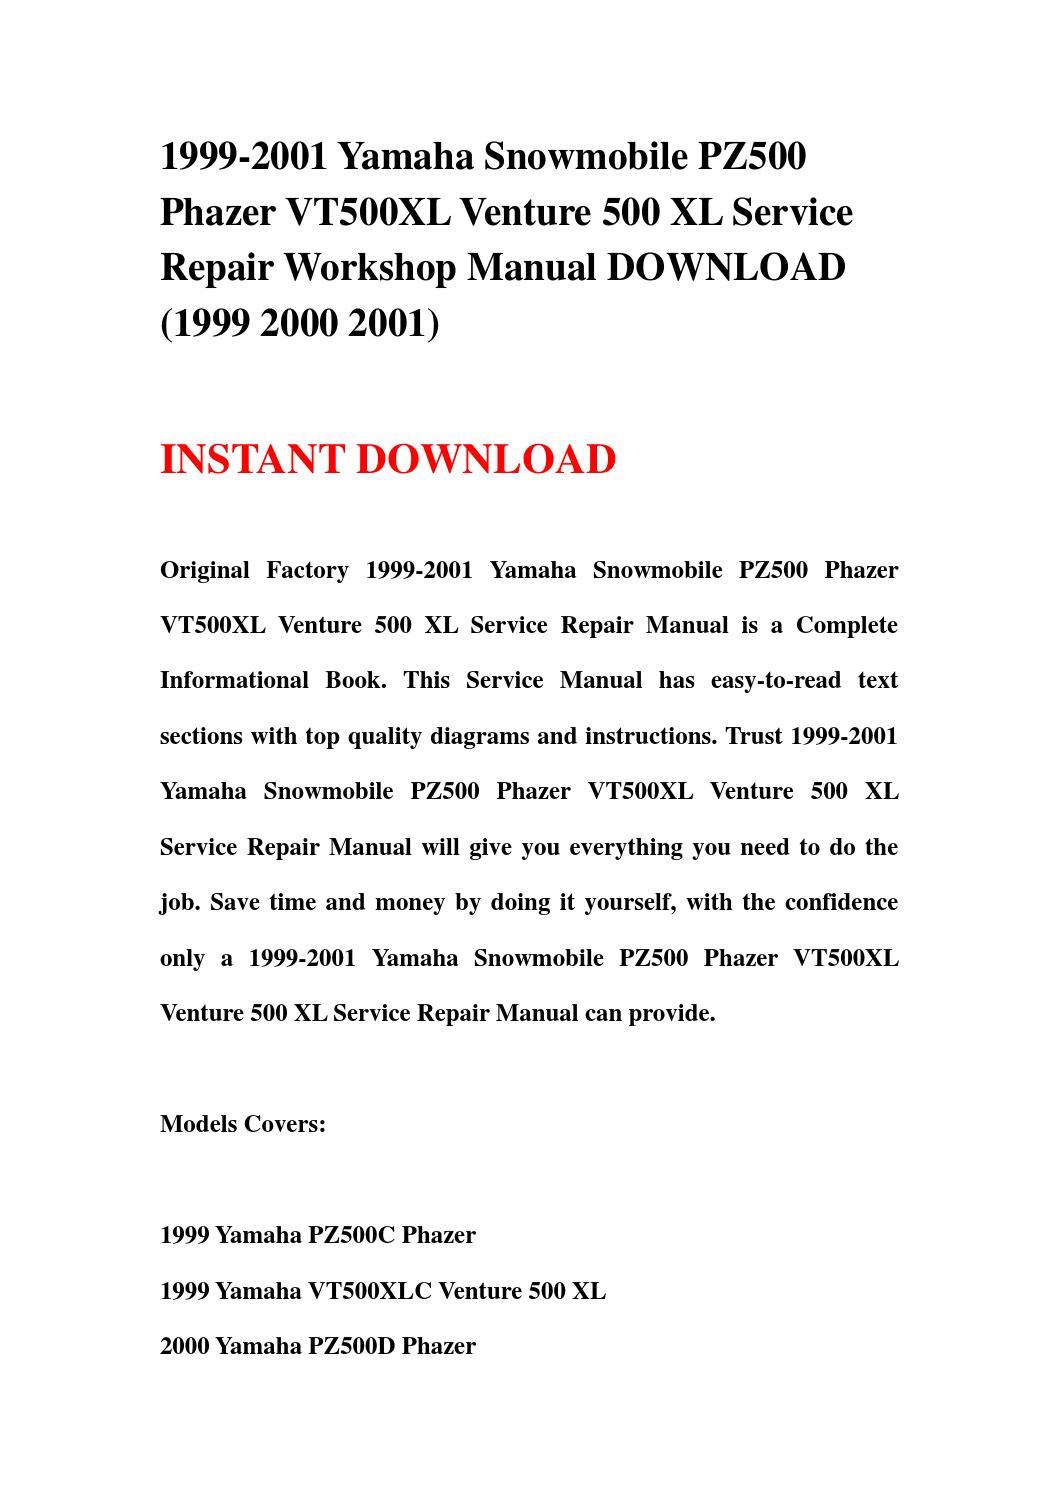 hight resolution of 1999 2001 yamaha snowmobile pz500 phazer vt500xl venture 500 xl service repair workshop manual downl